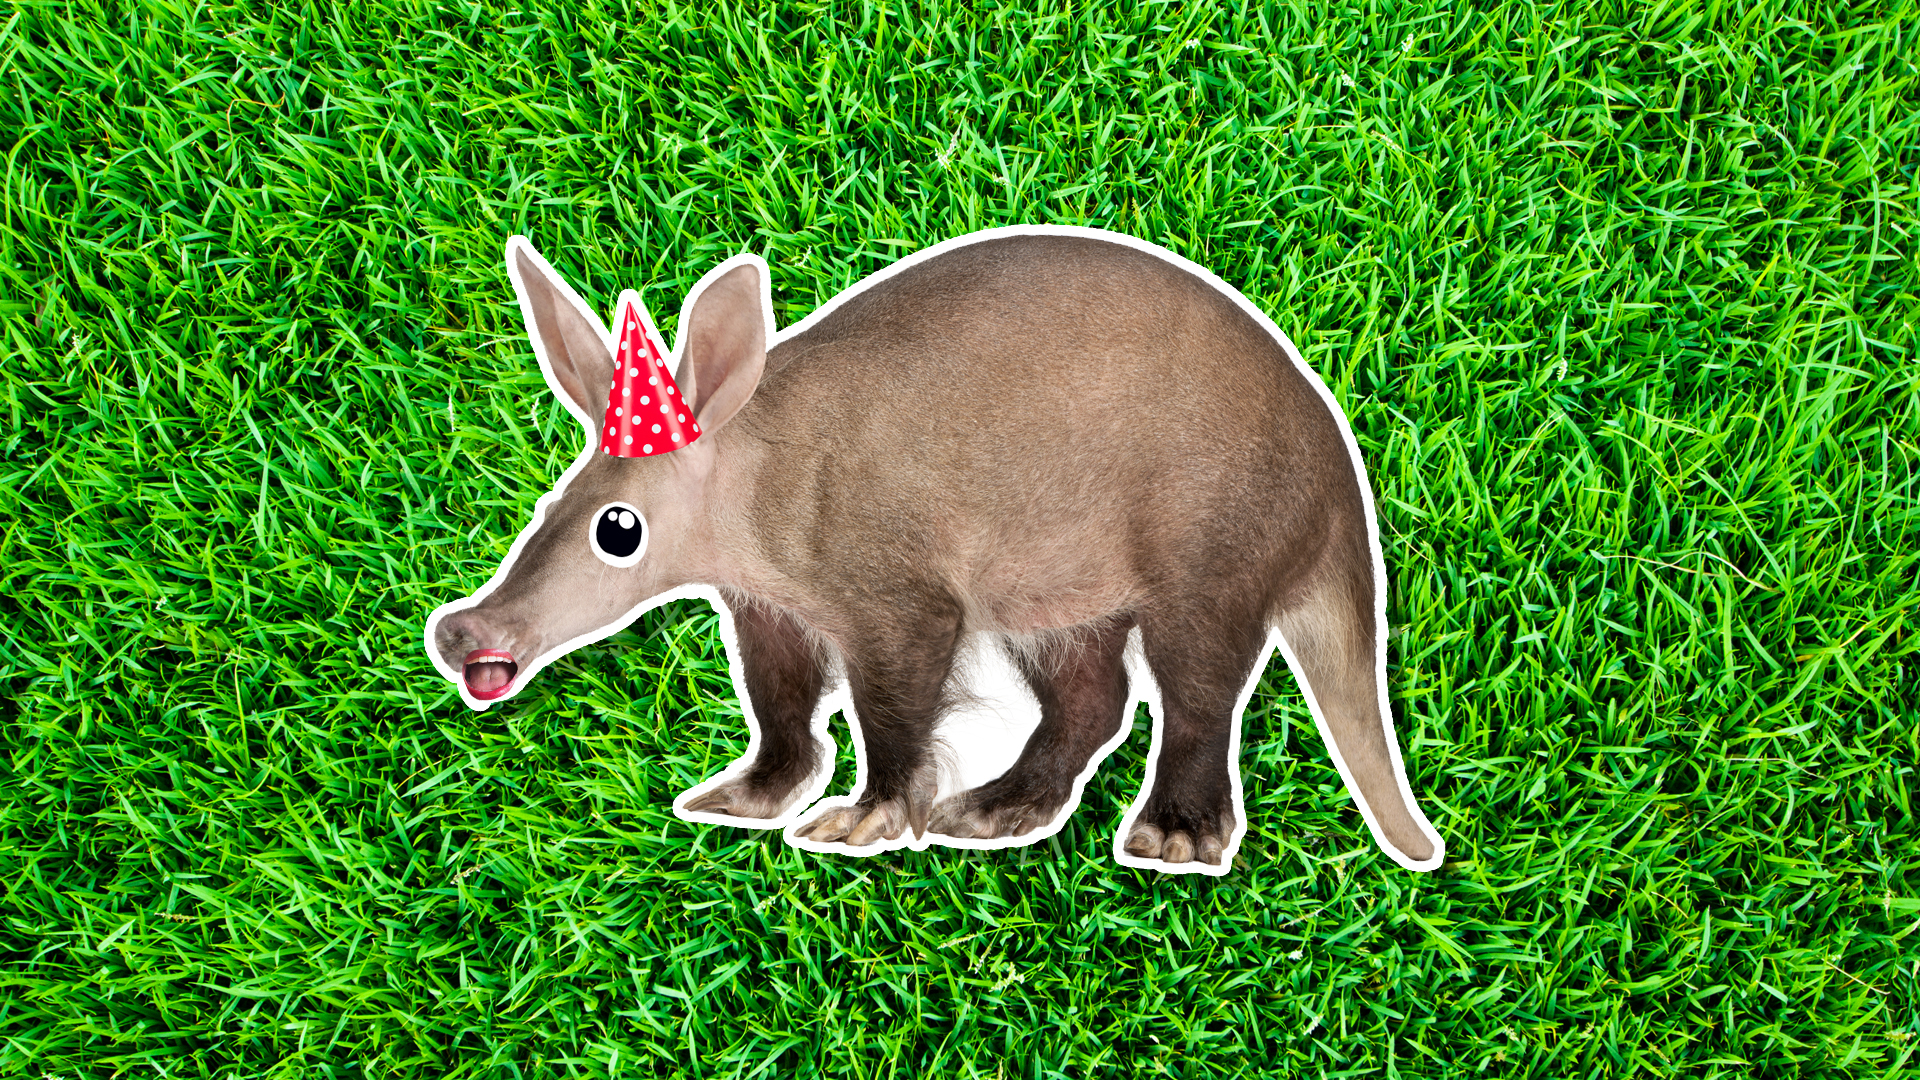 An aardvark in a party hat